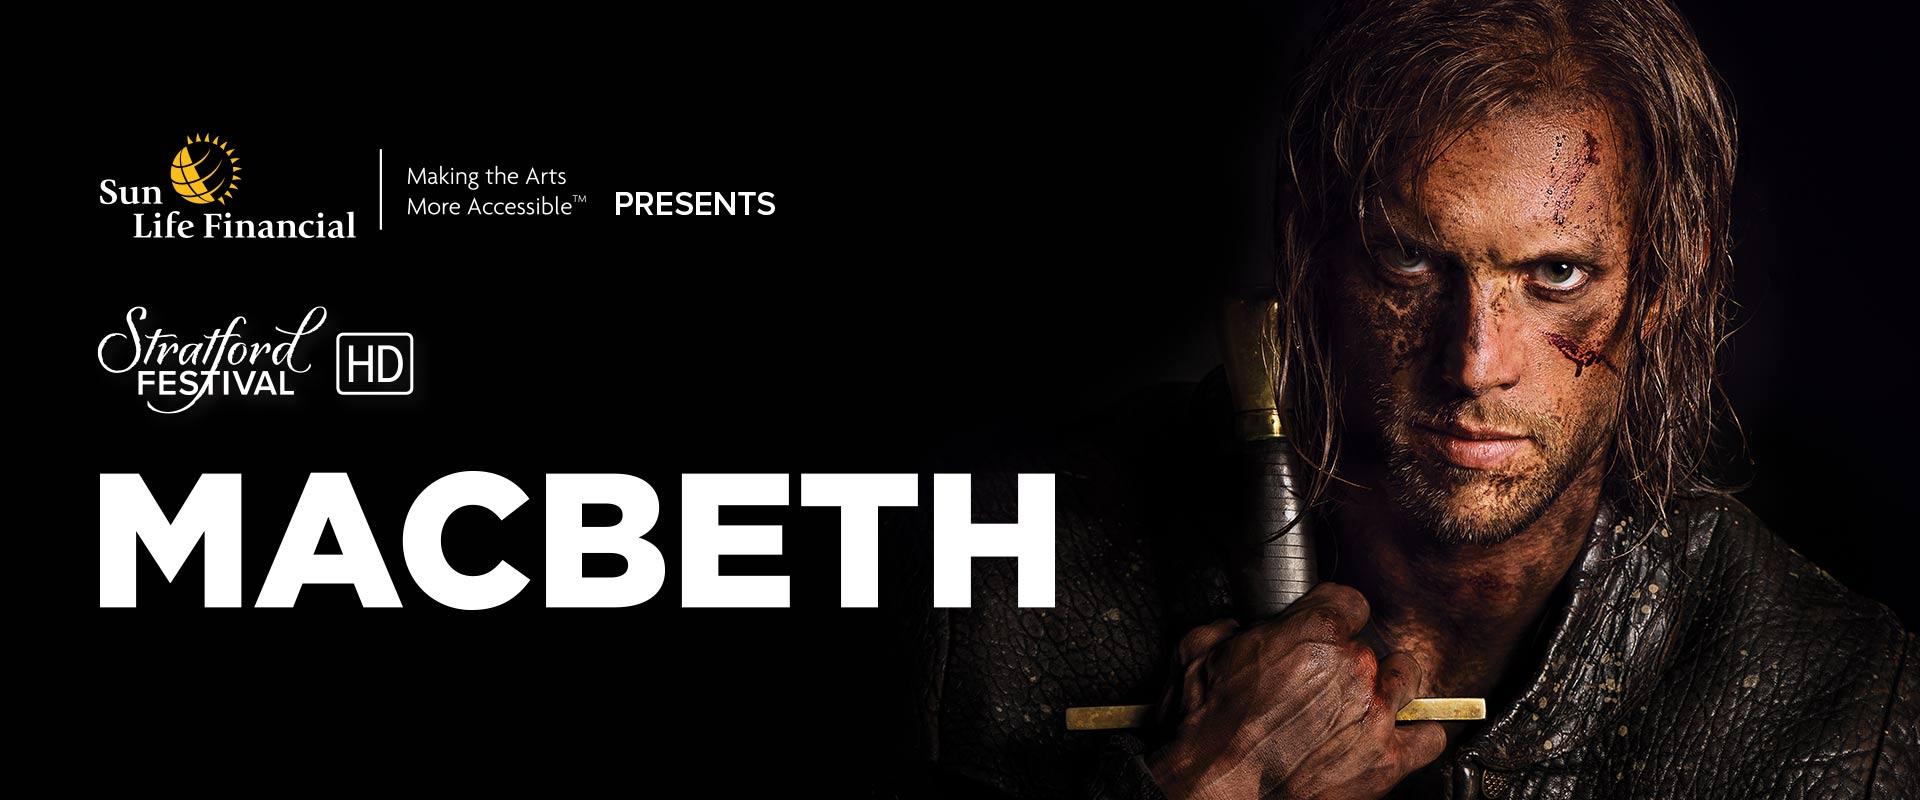 Performance Plus Macbeth Banner